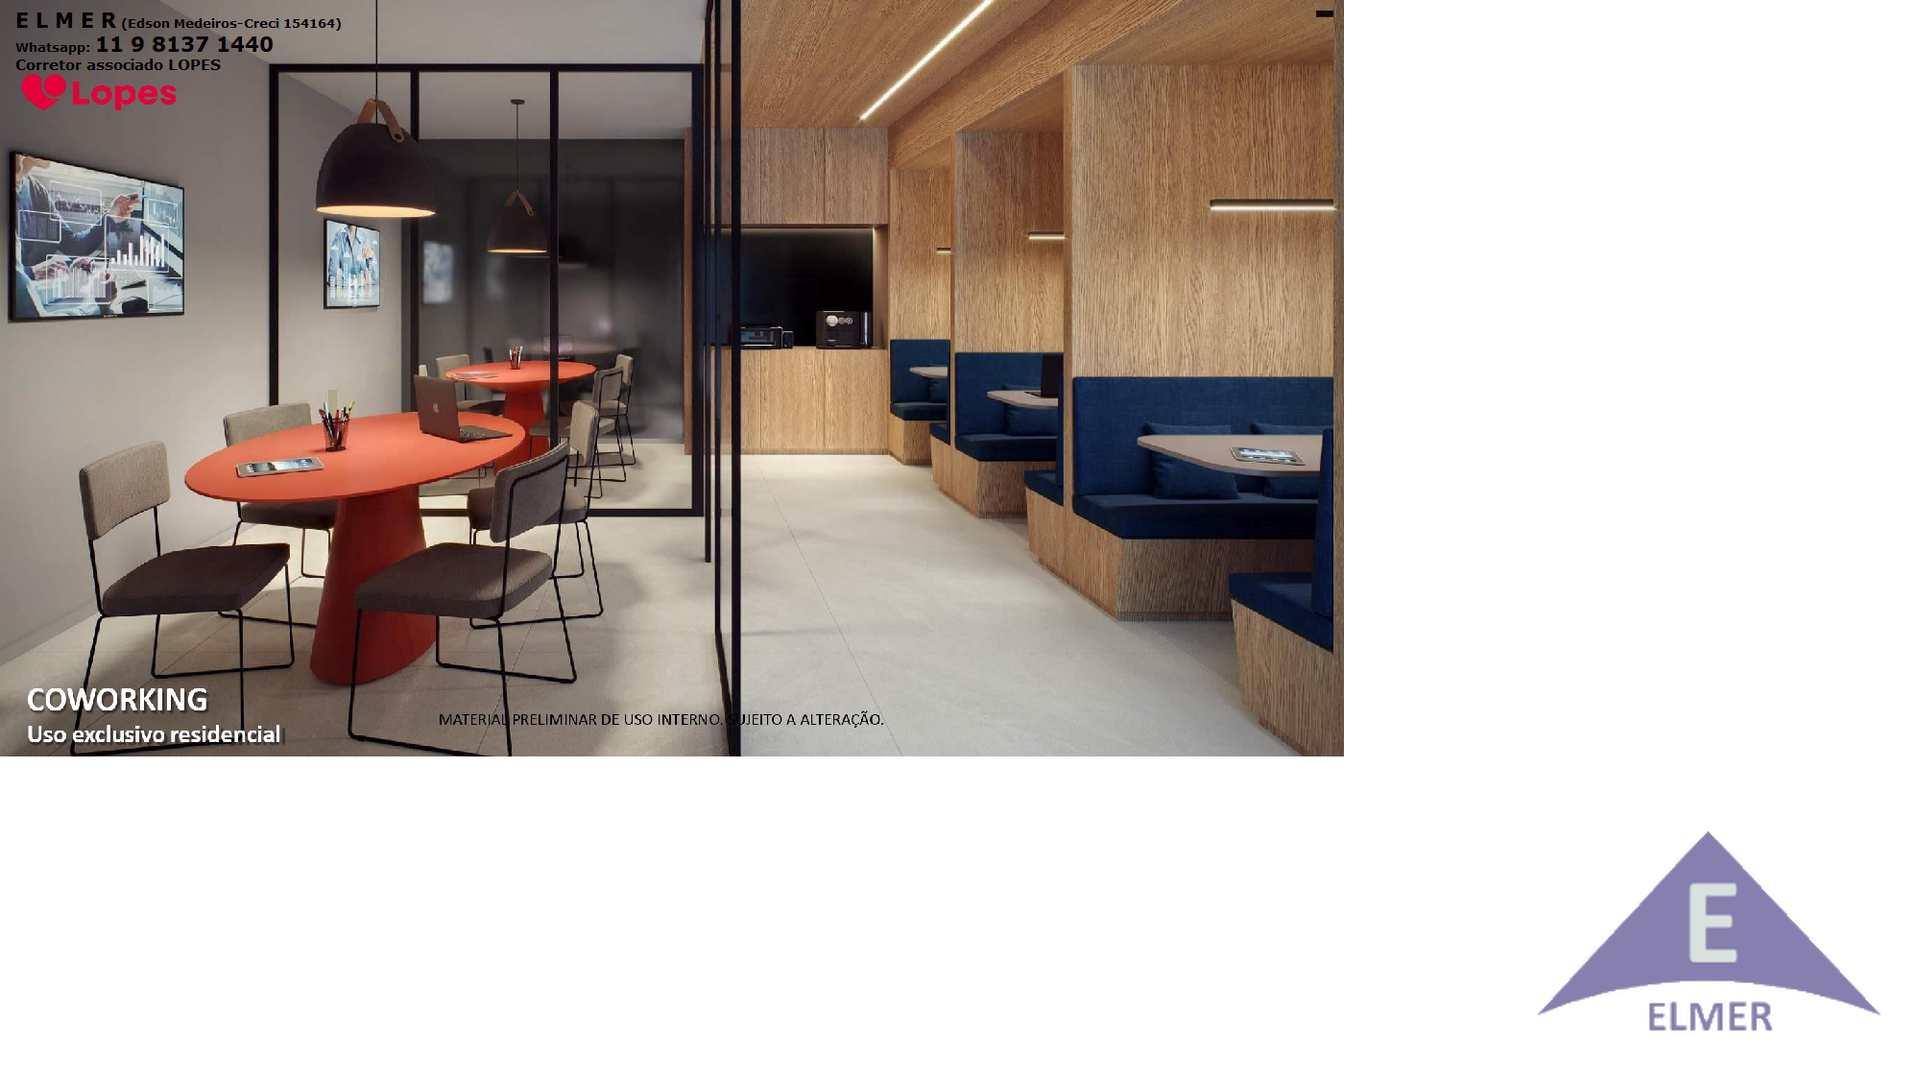 10 -Coworking - Haus Mitre -Campo-Belo - Elmer